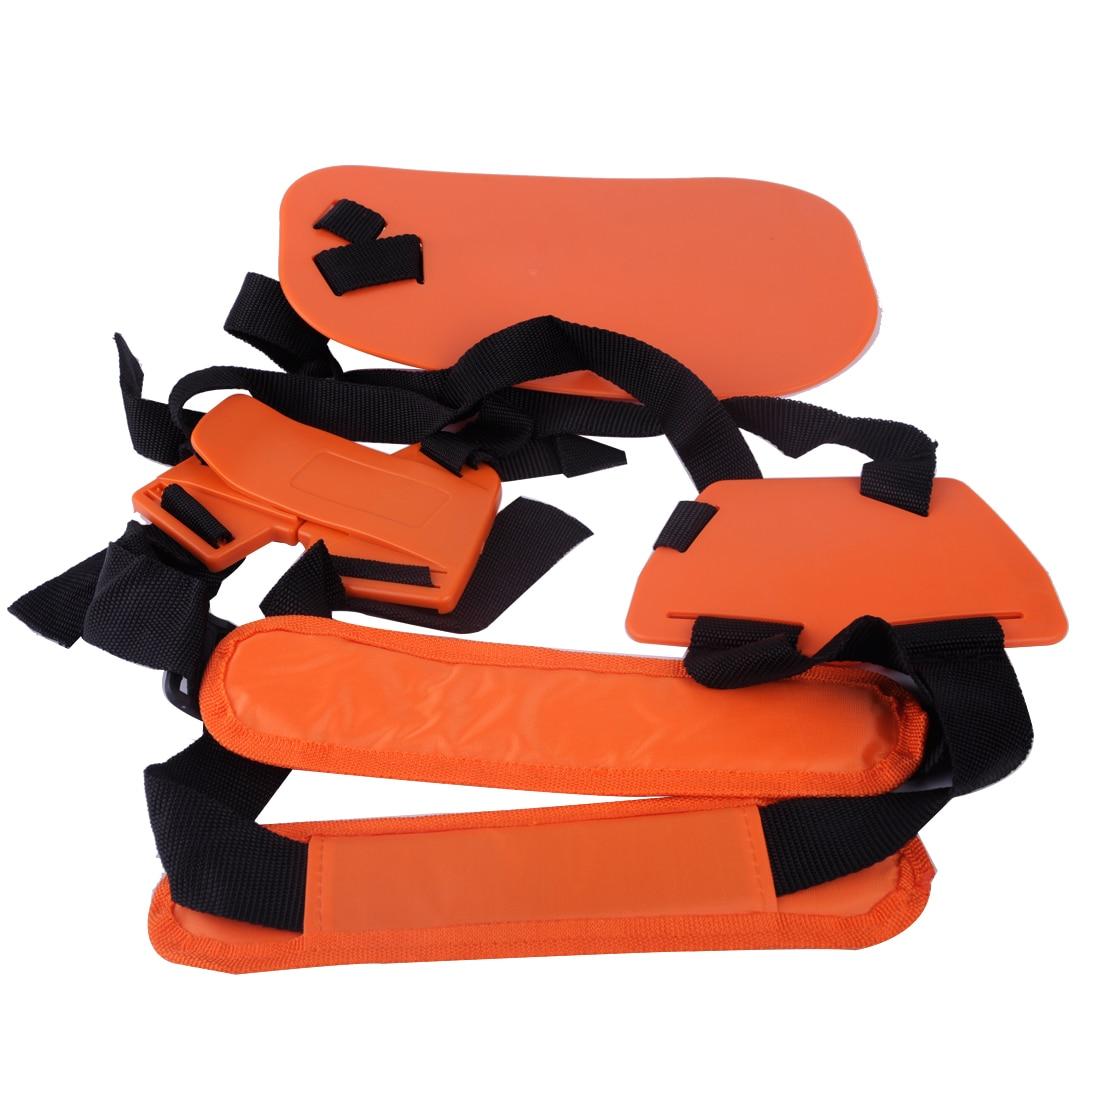 LETAOSK New Orange Double Shoulder Strap Harness Lawn Mower Garden Power Pruner Padded for Stihl Brush Cutter Trimmer FS56 FS550